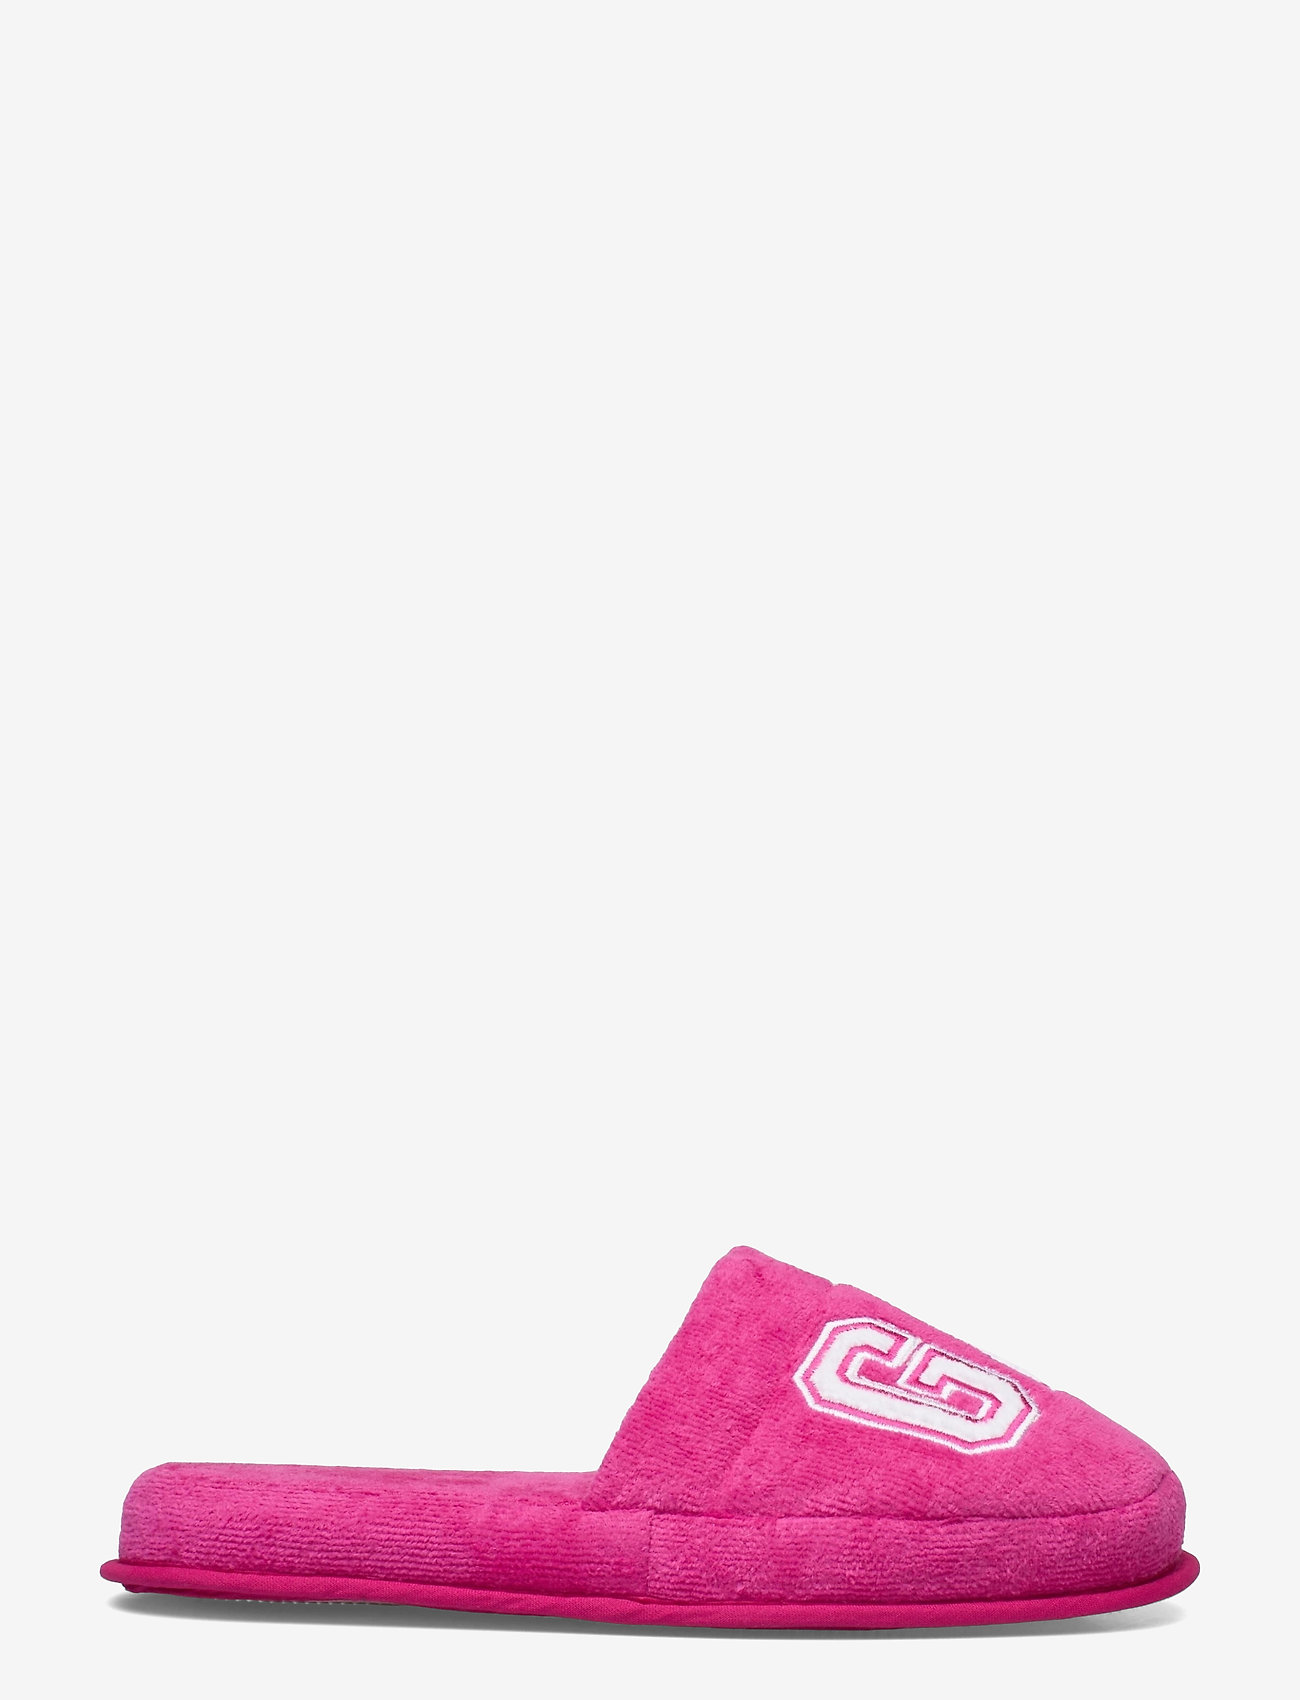 GANT - VACAY SLIPPERS - odzież - cabaret pink - 0